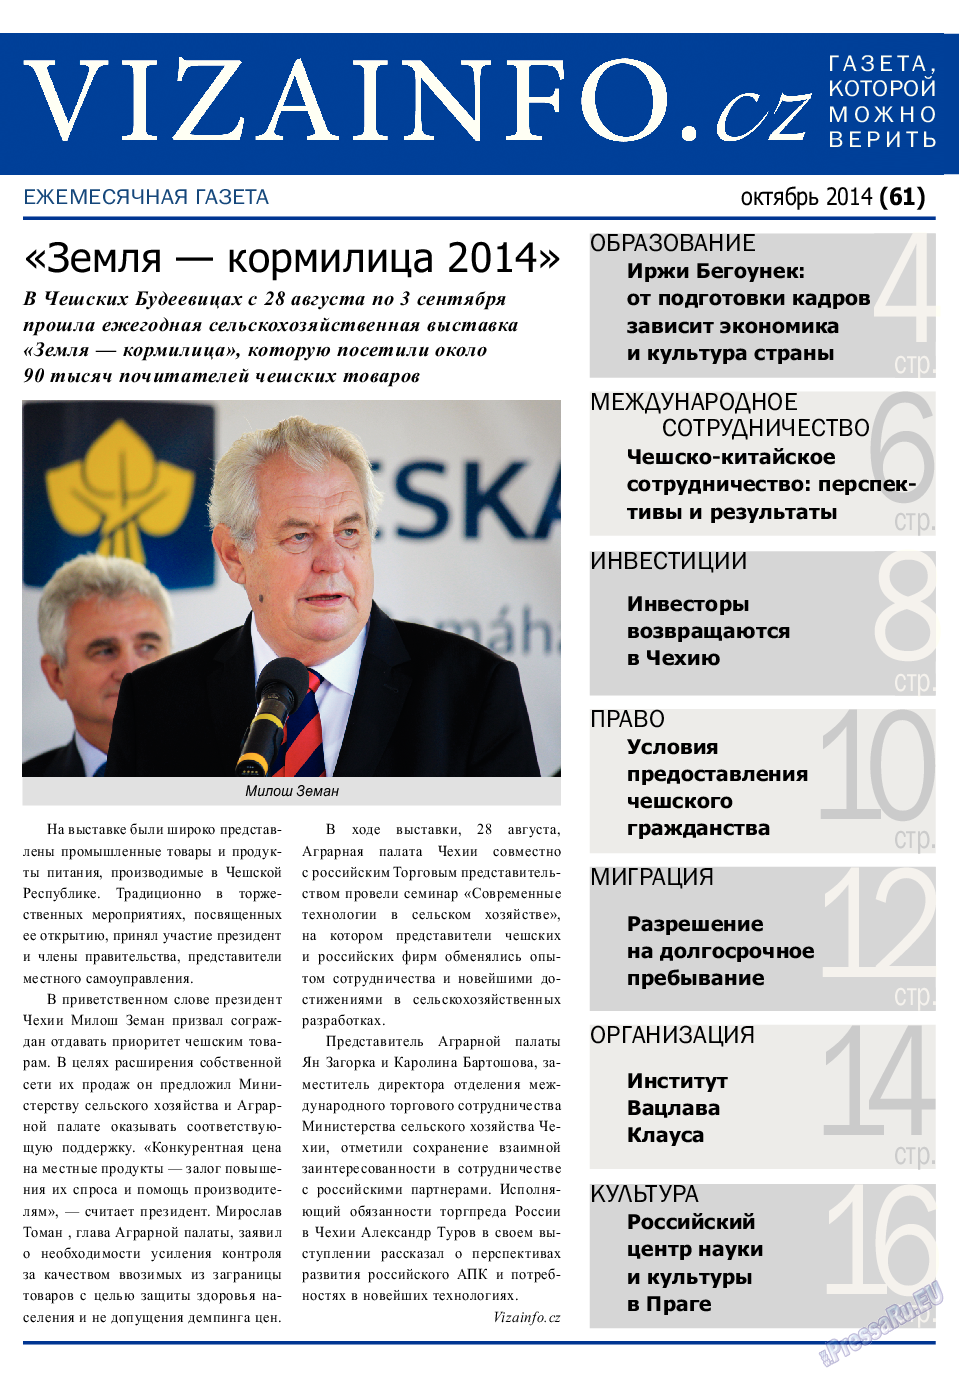 Vizainfo.cz (газета). 2014 год, номер 61, стр. 1